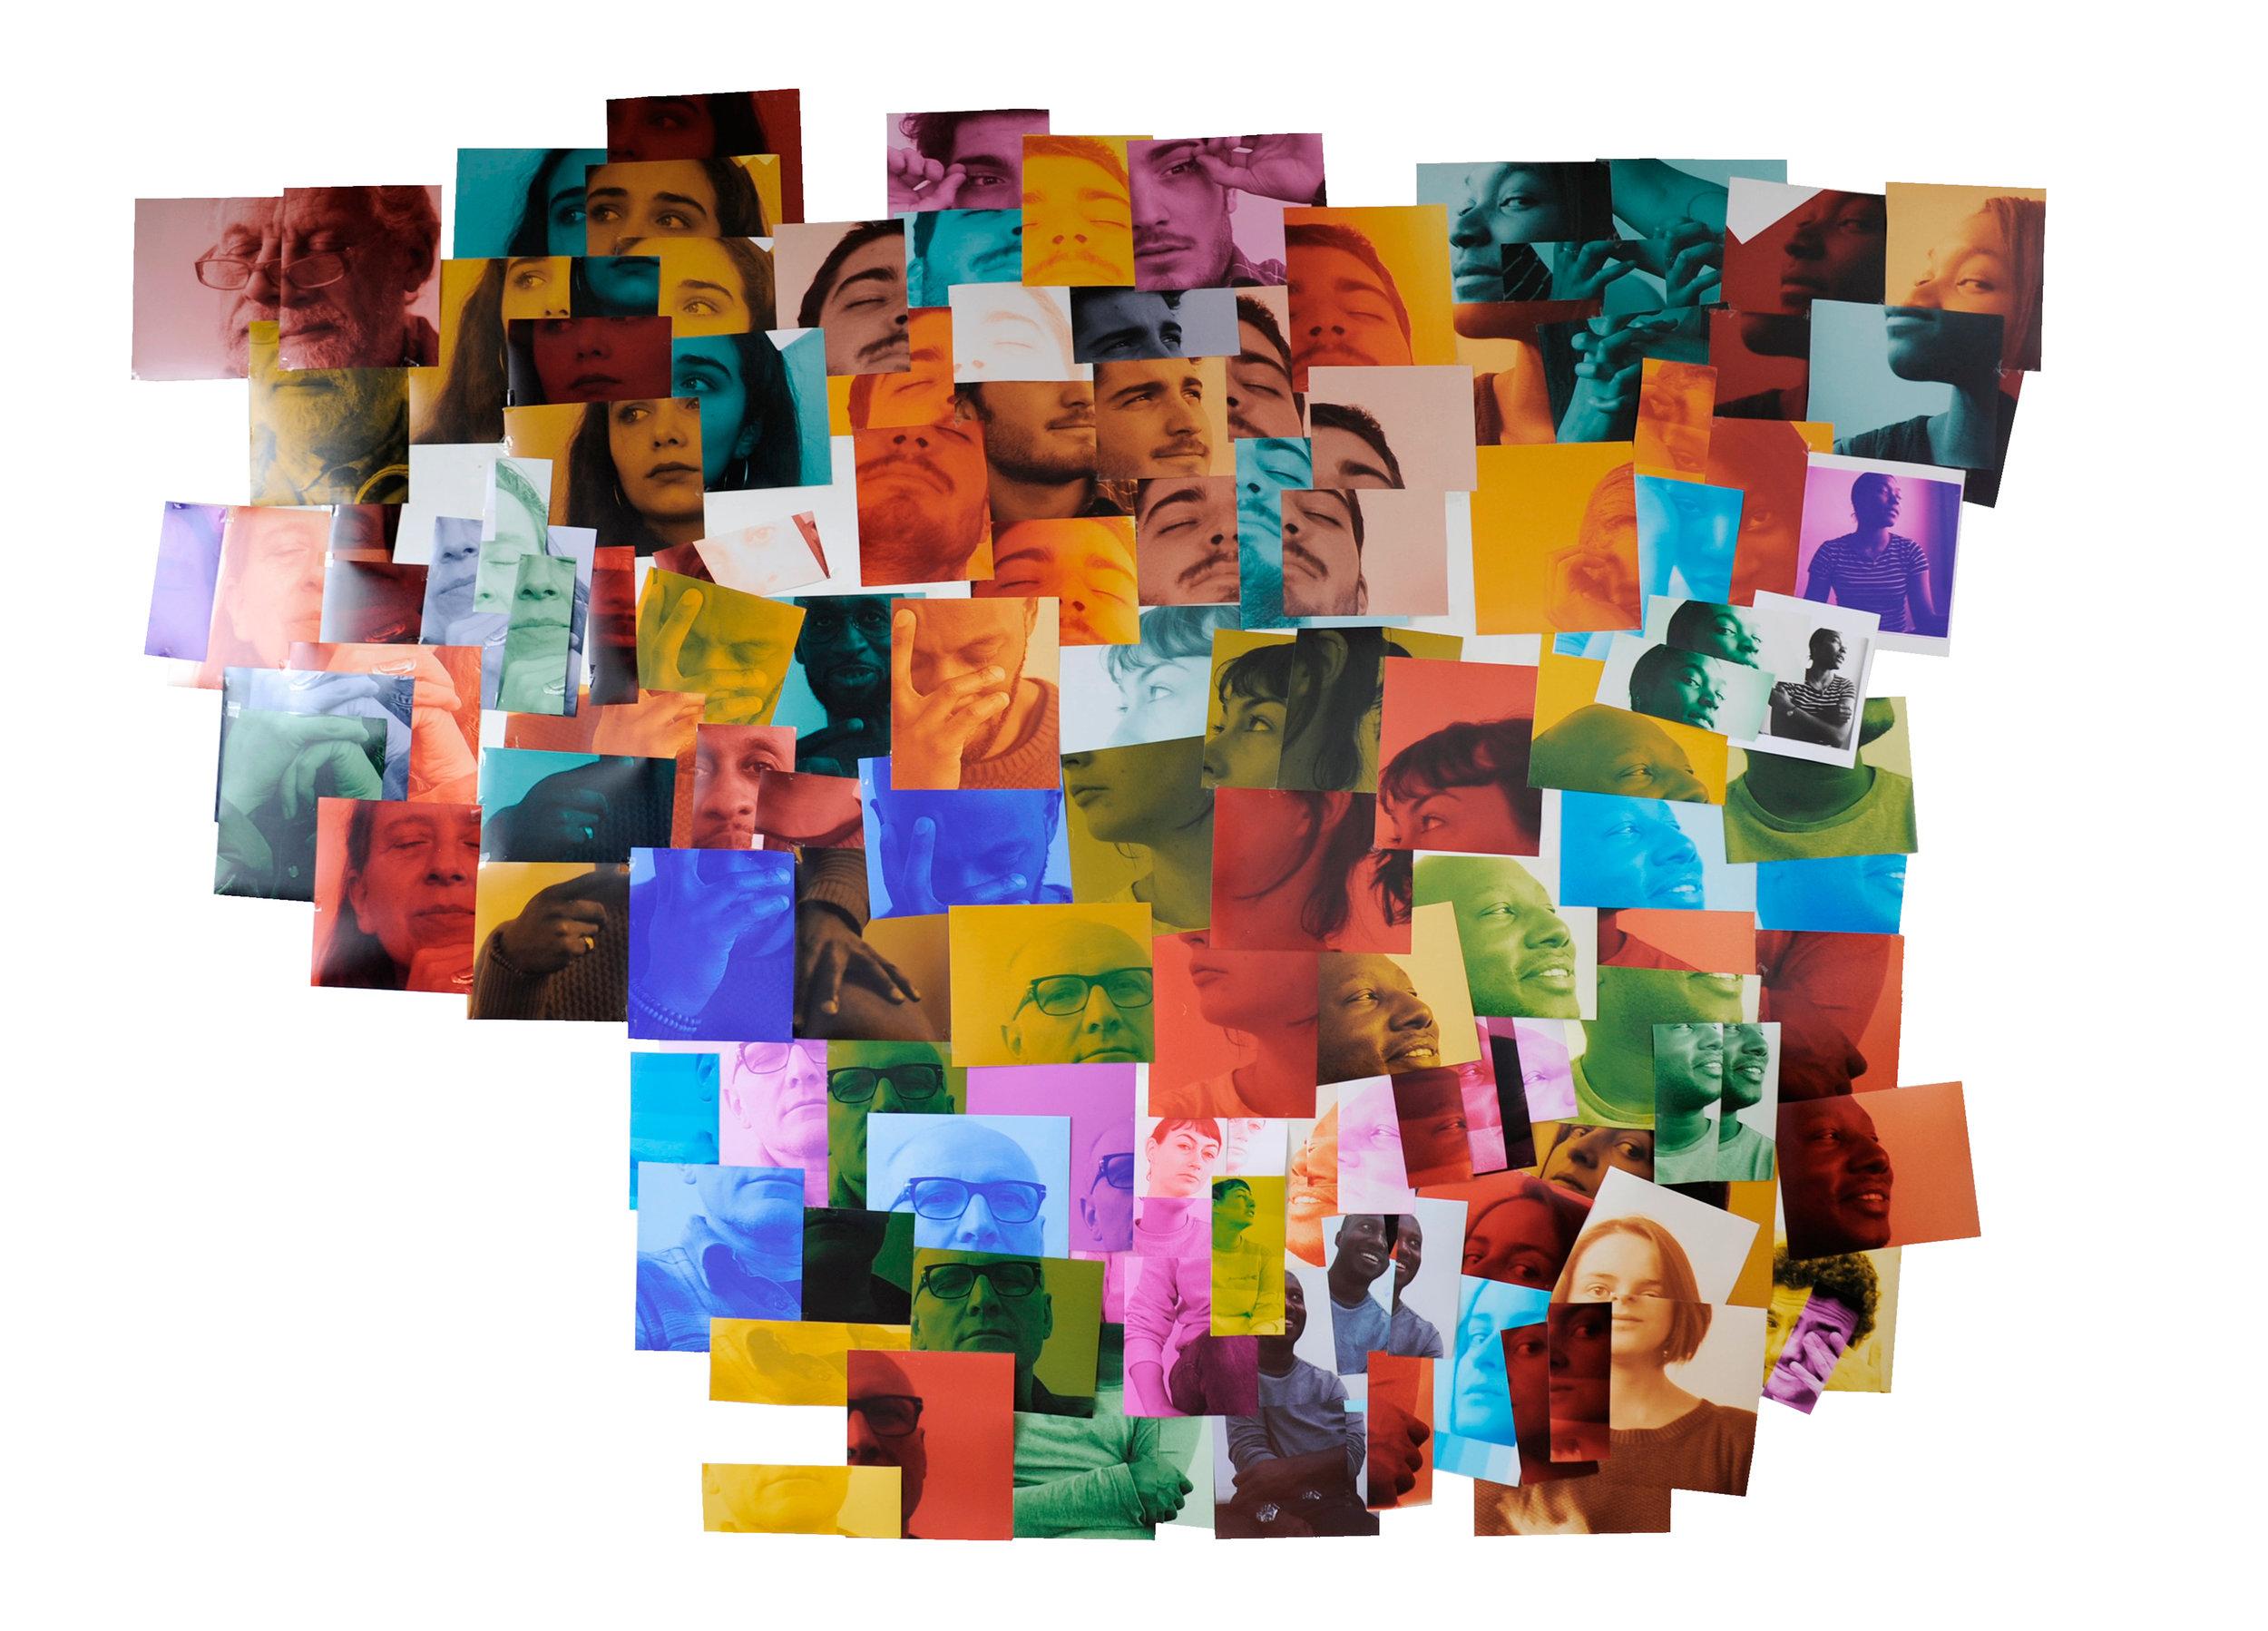 mural-colour-1_7929_net_fondoblanco.jpg